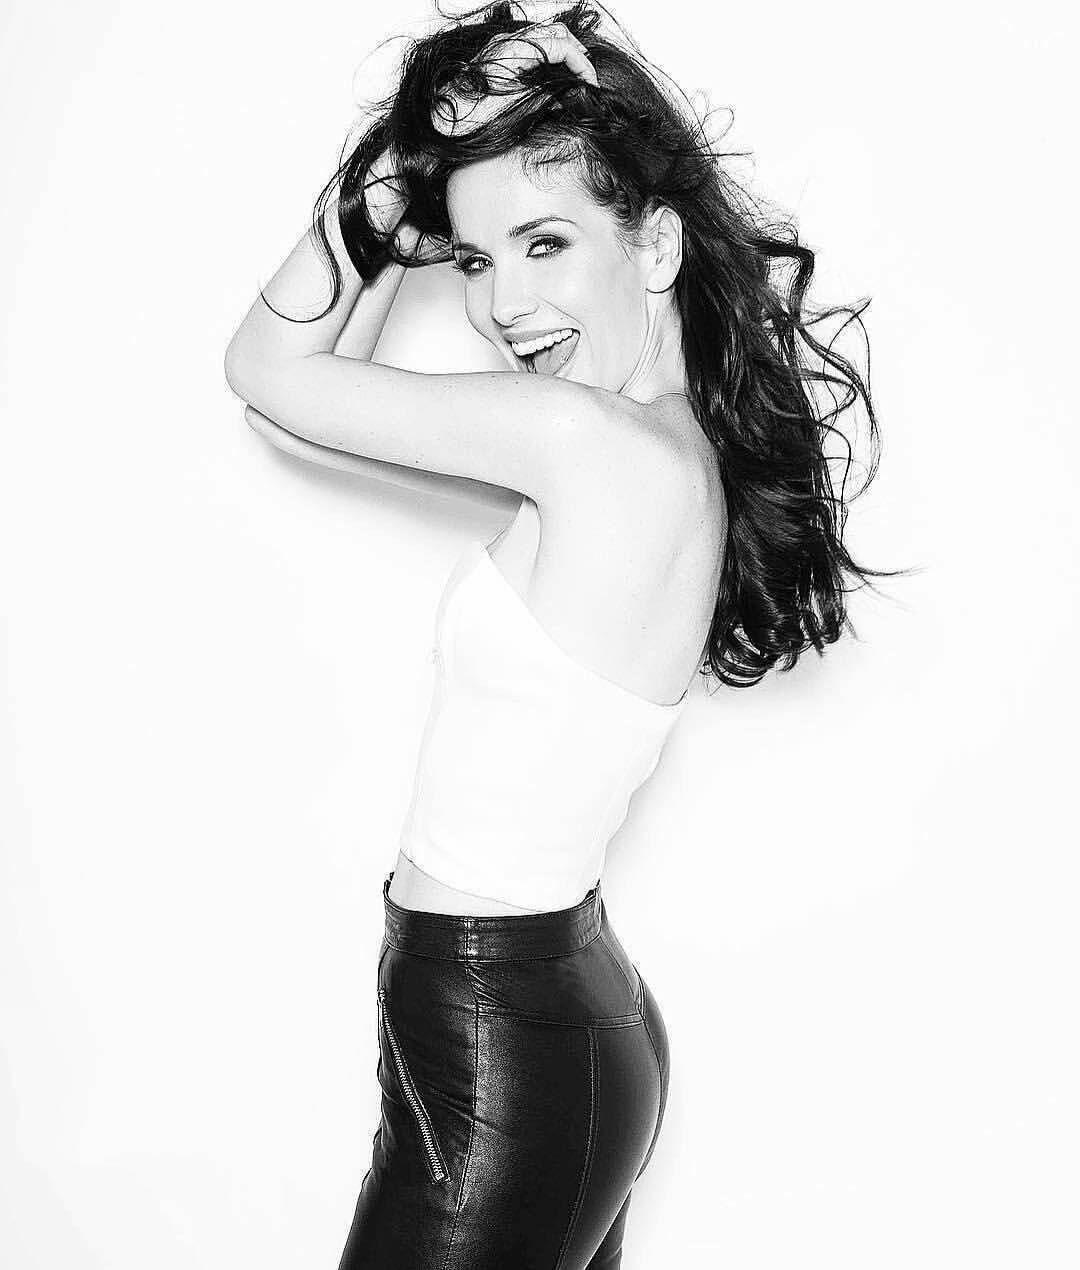 Hacked Natalia Oreiro nudes (12 images), Tits